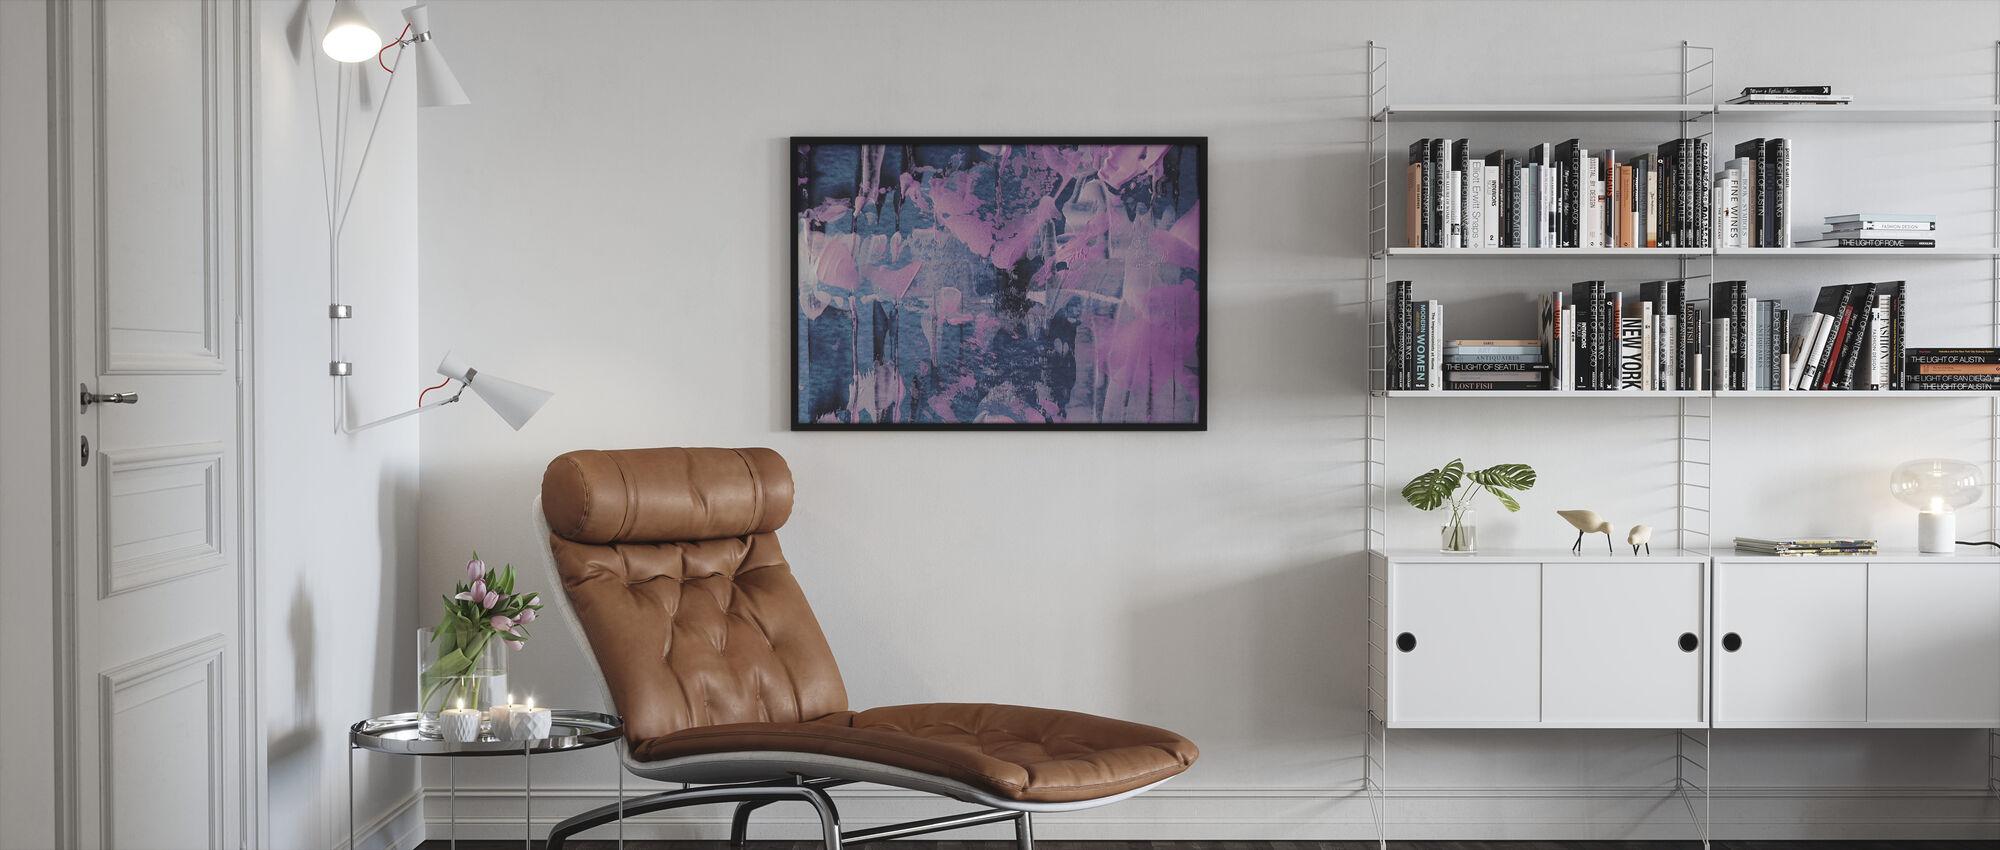 Pinkys Dream - Framed print - Living Room